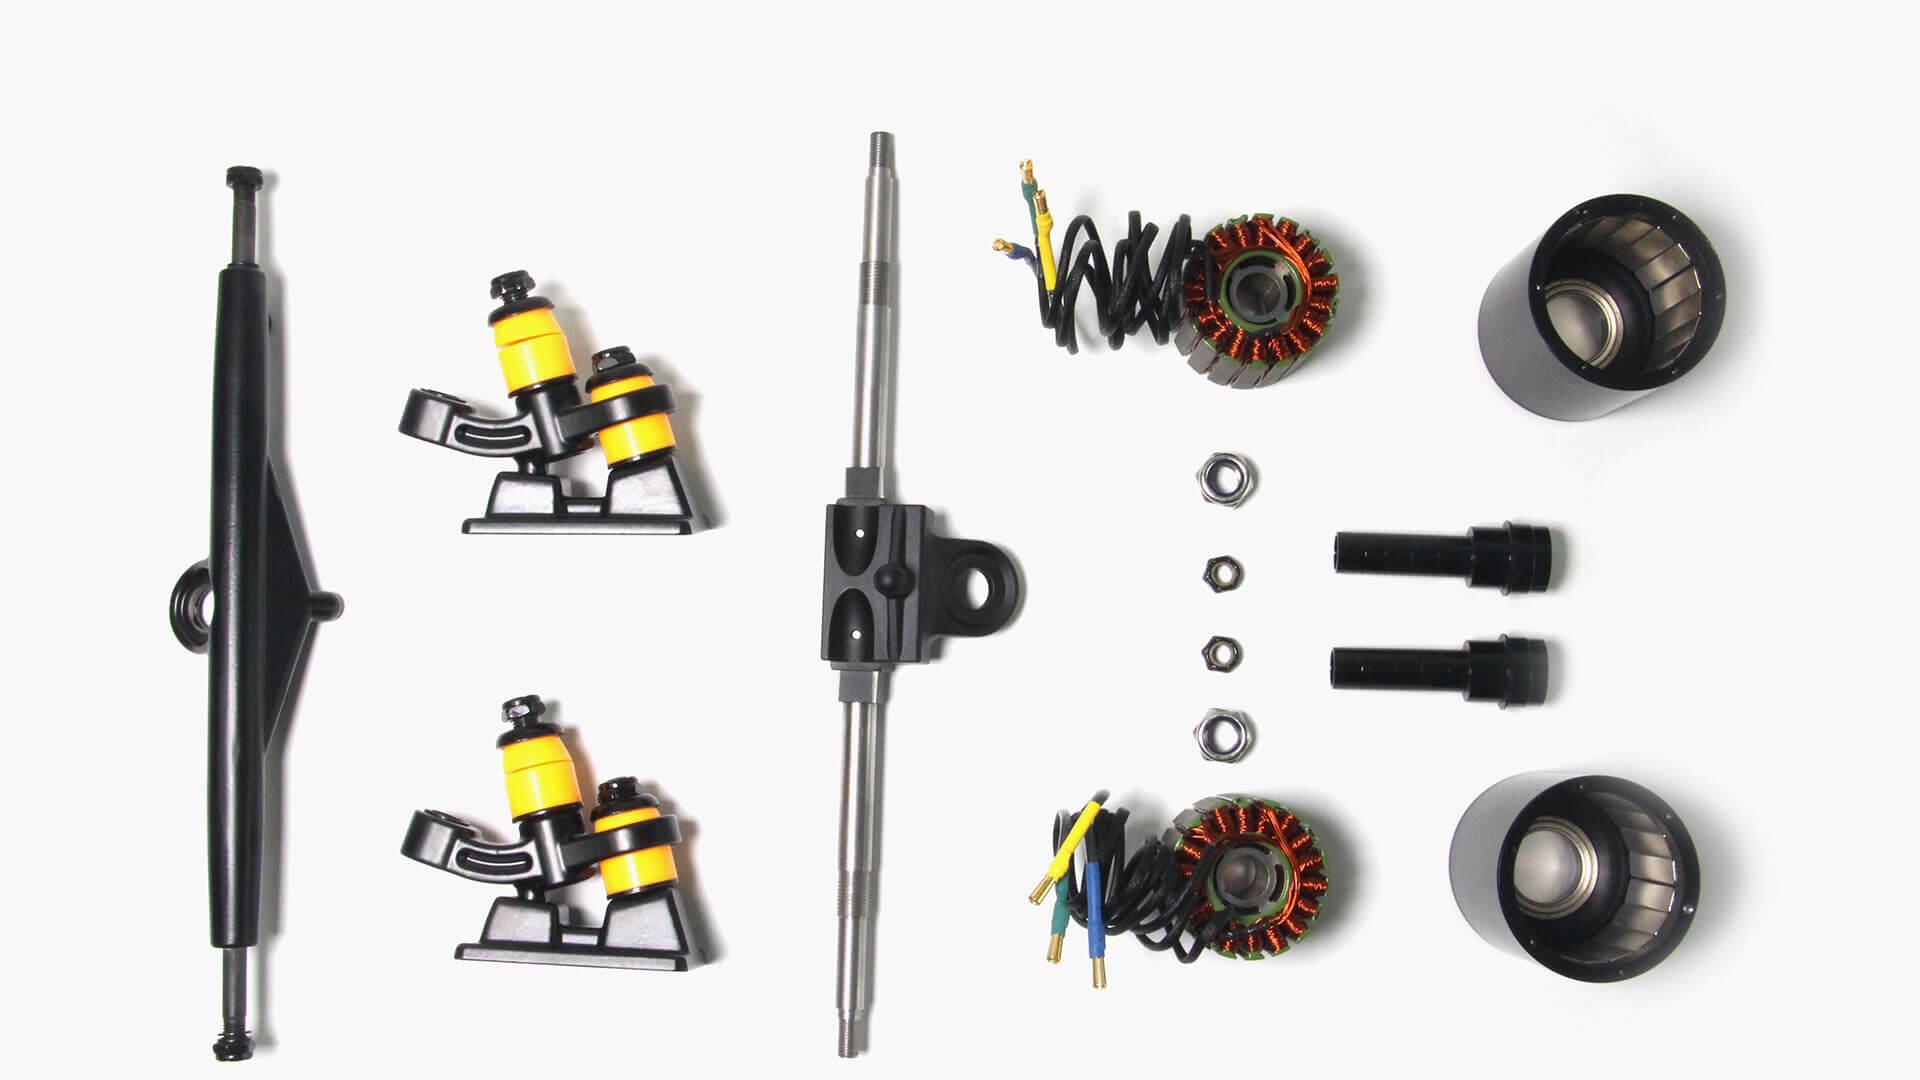 direct drive motor kit boundmotor.com